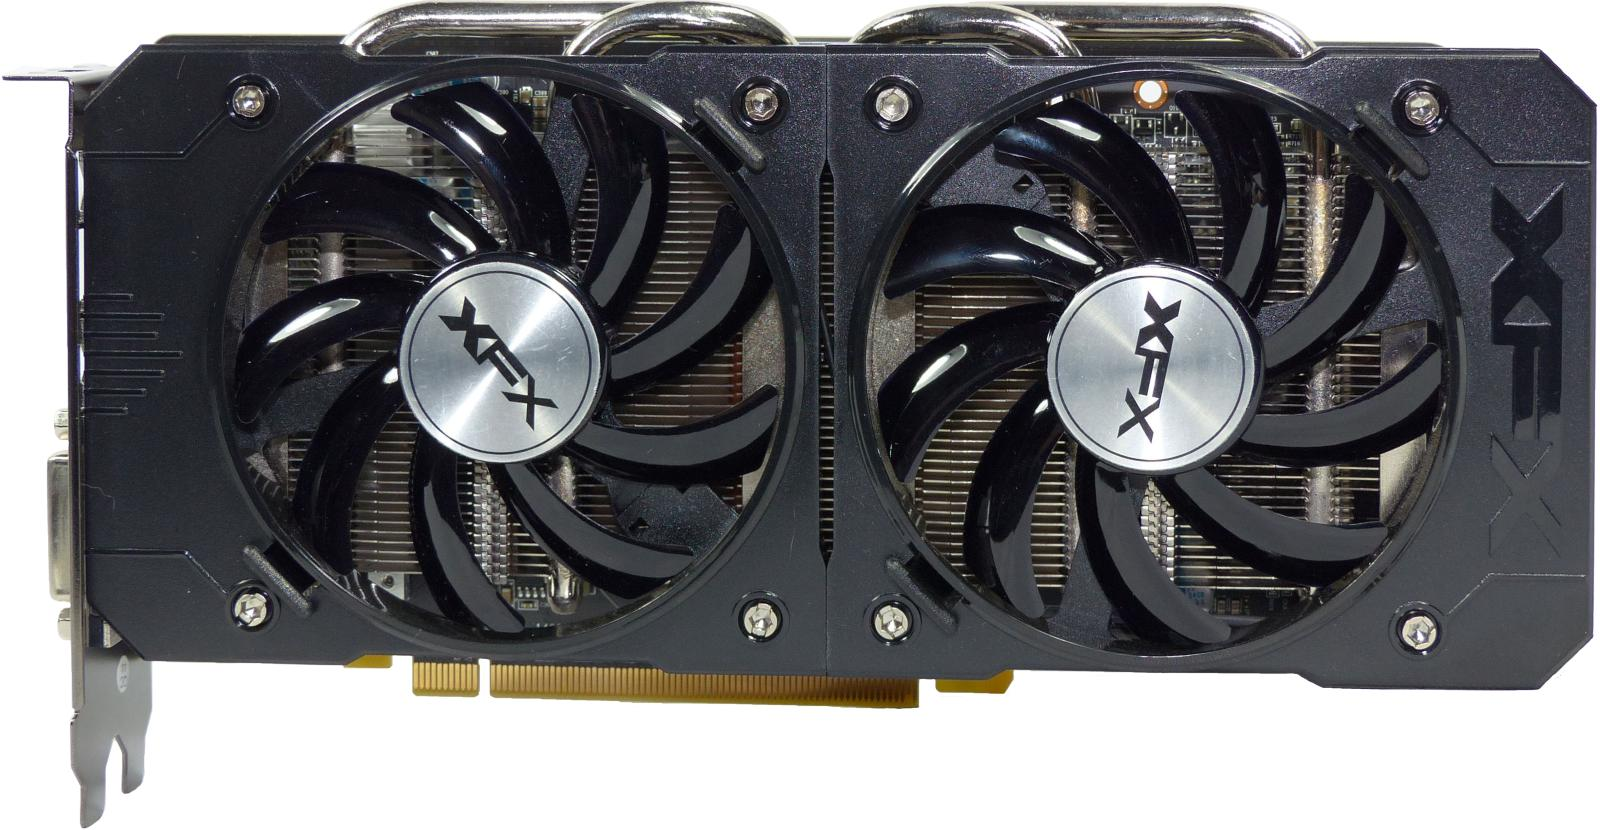 XFX Radeon R9 380X Double Dissipation Black Edition